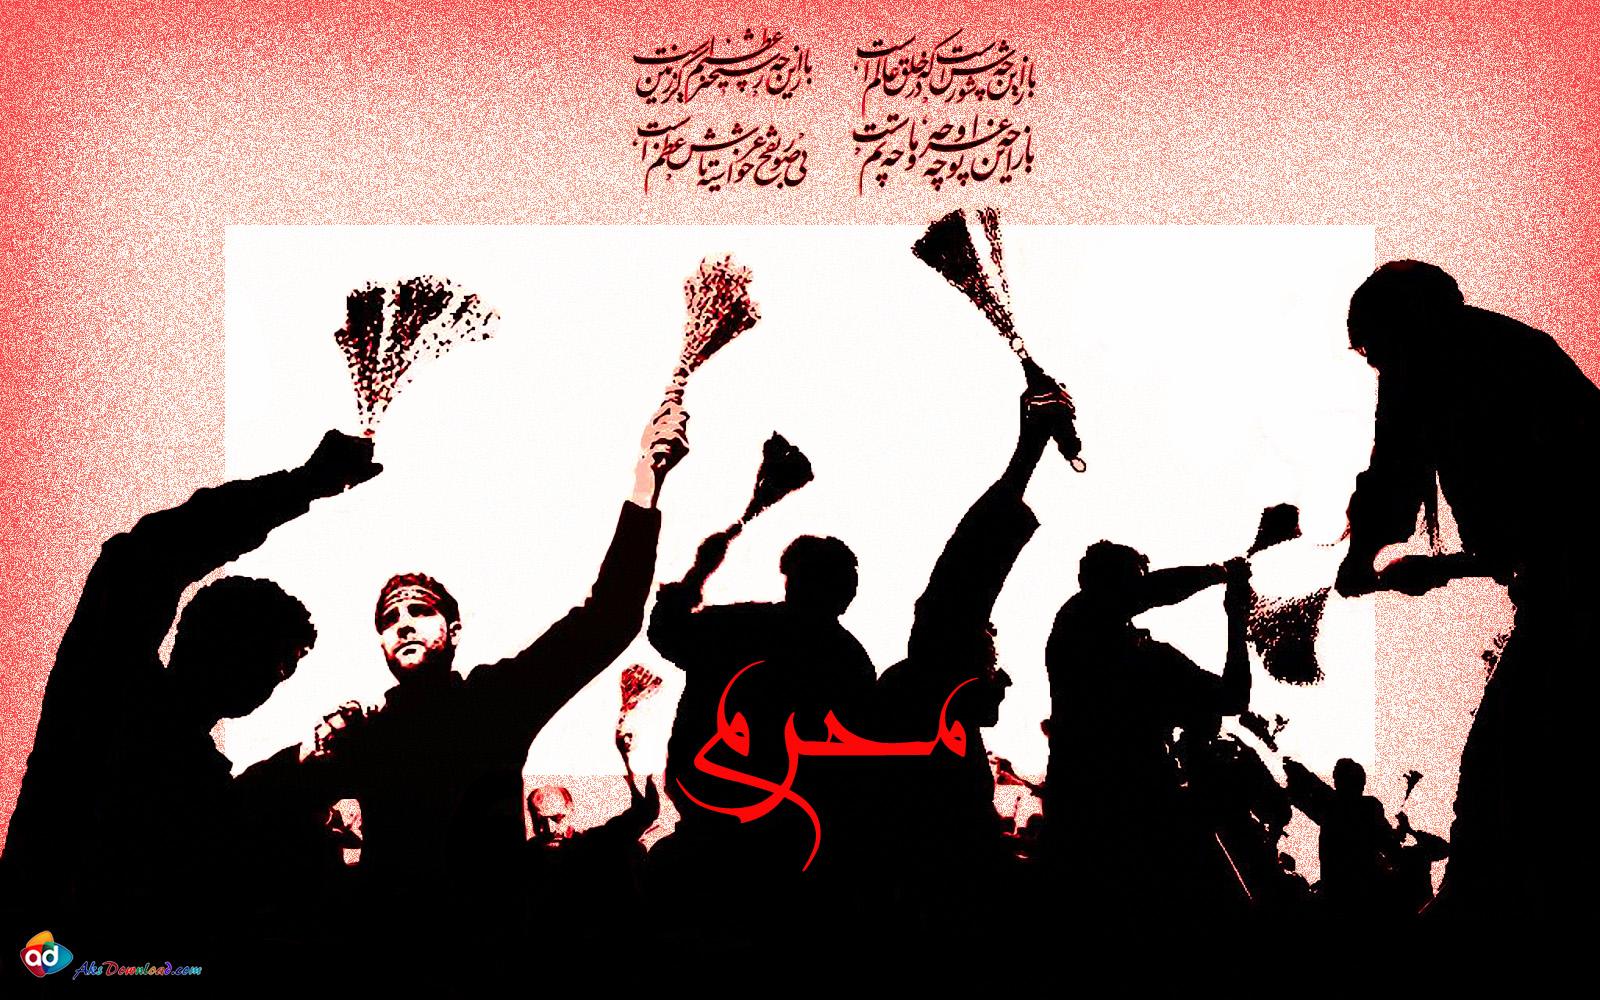 Azadari for Hussein (Lamentation in the day of Ashura in Muharram) الصورة خلفية: محرم وعاشوراء